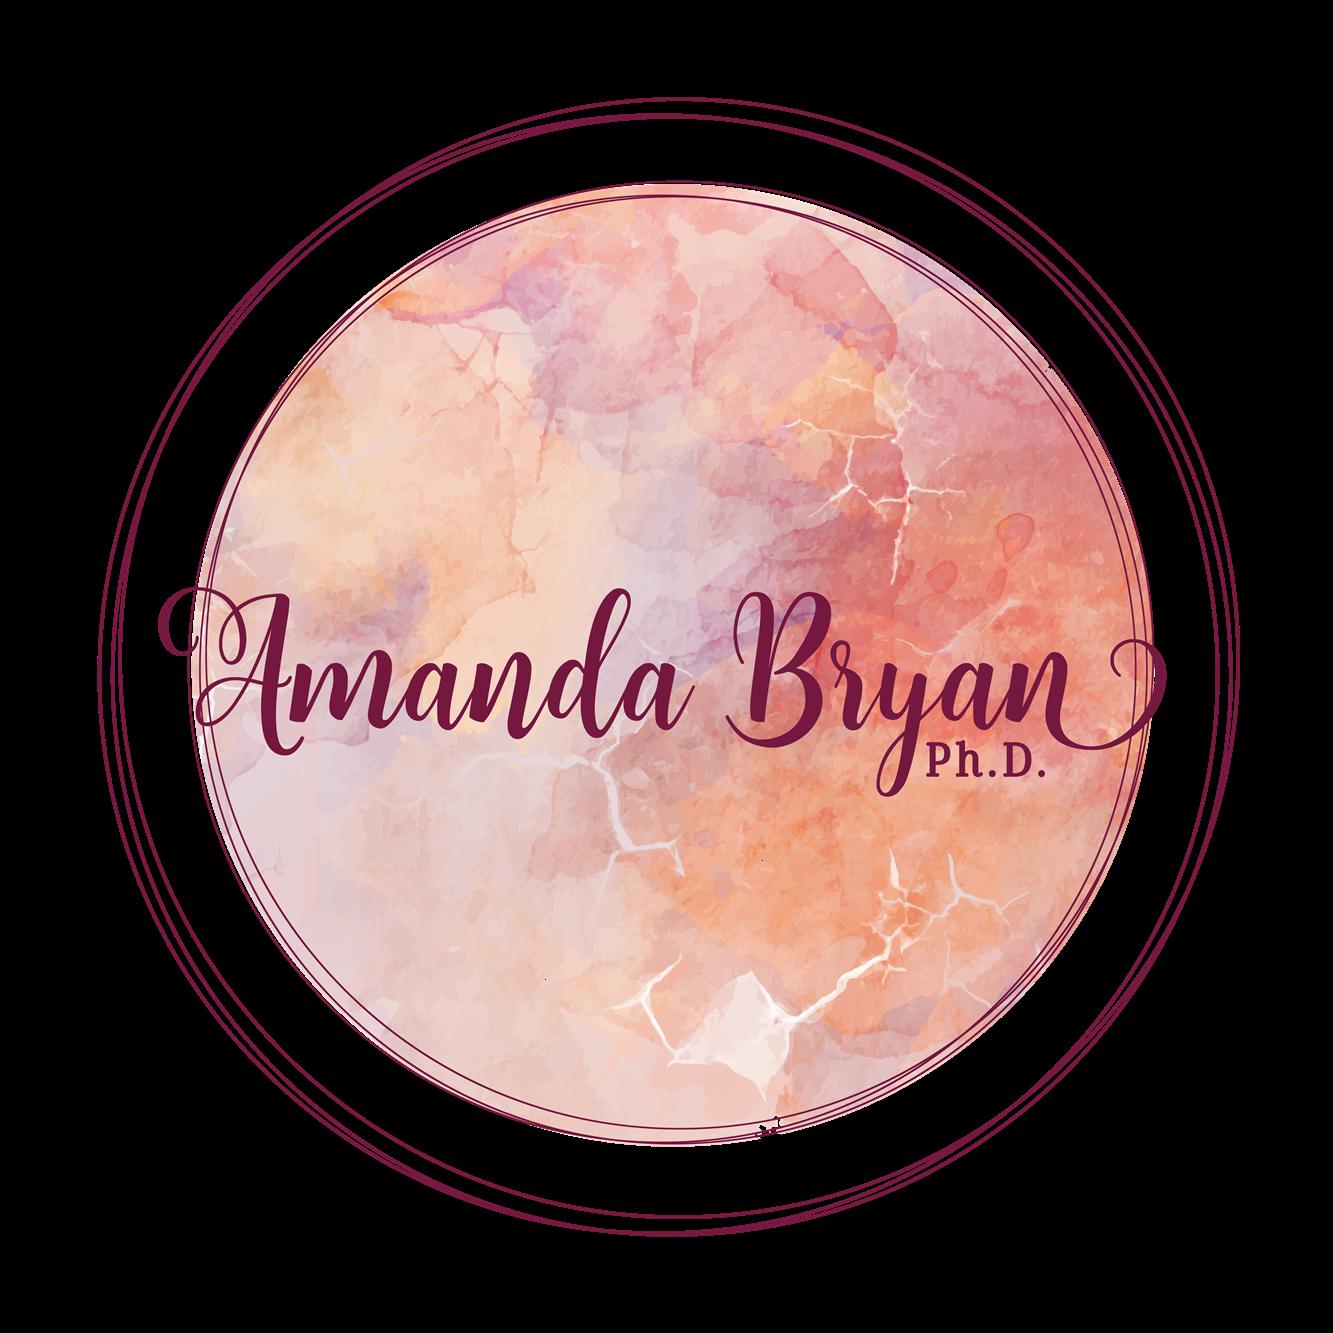 Amanda Bryan, Ph.D.